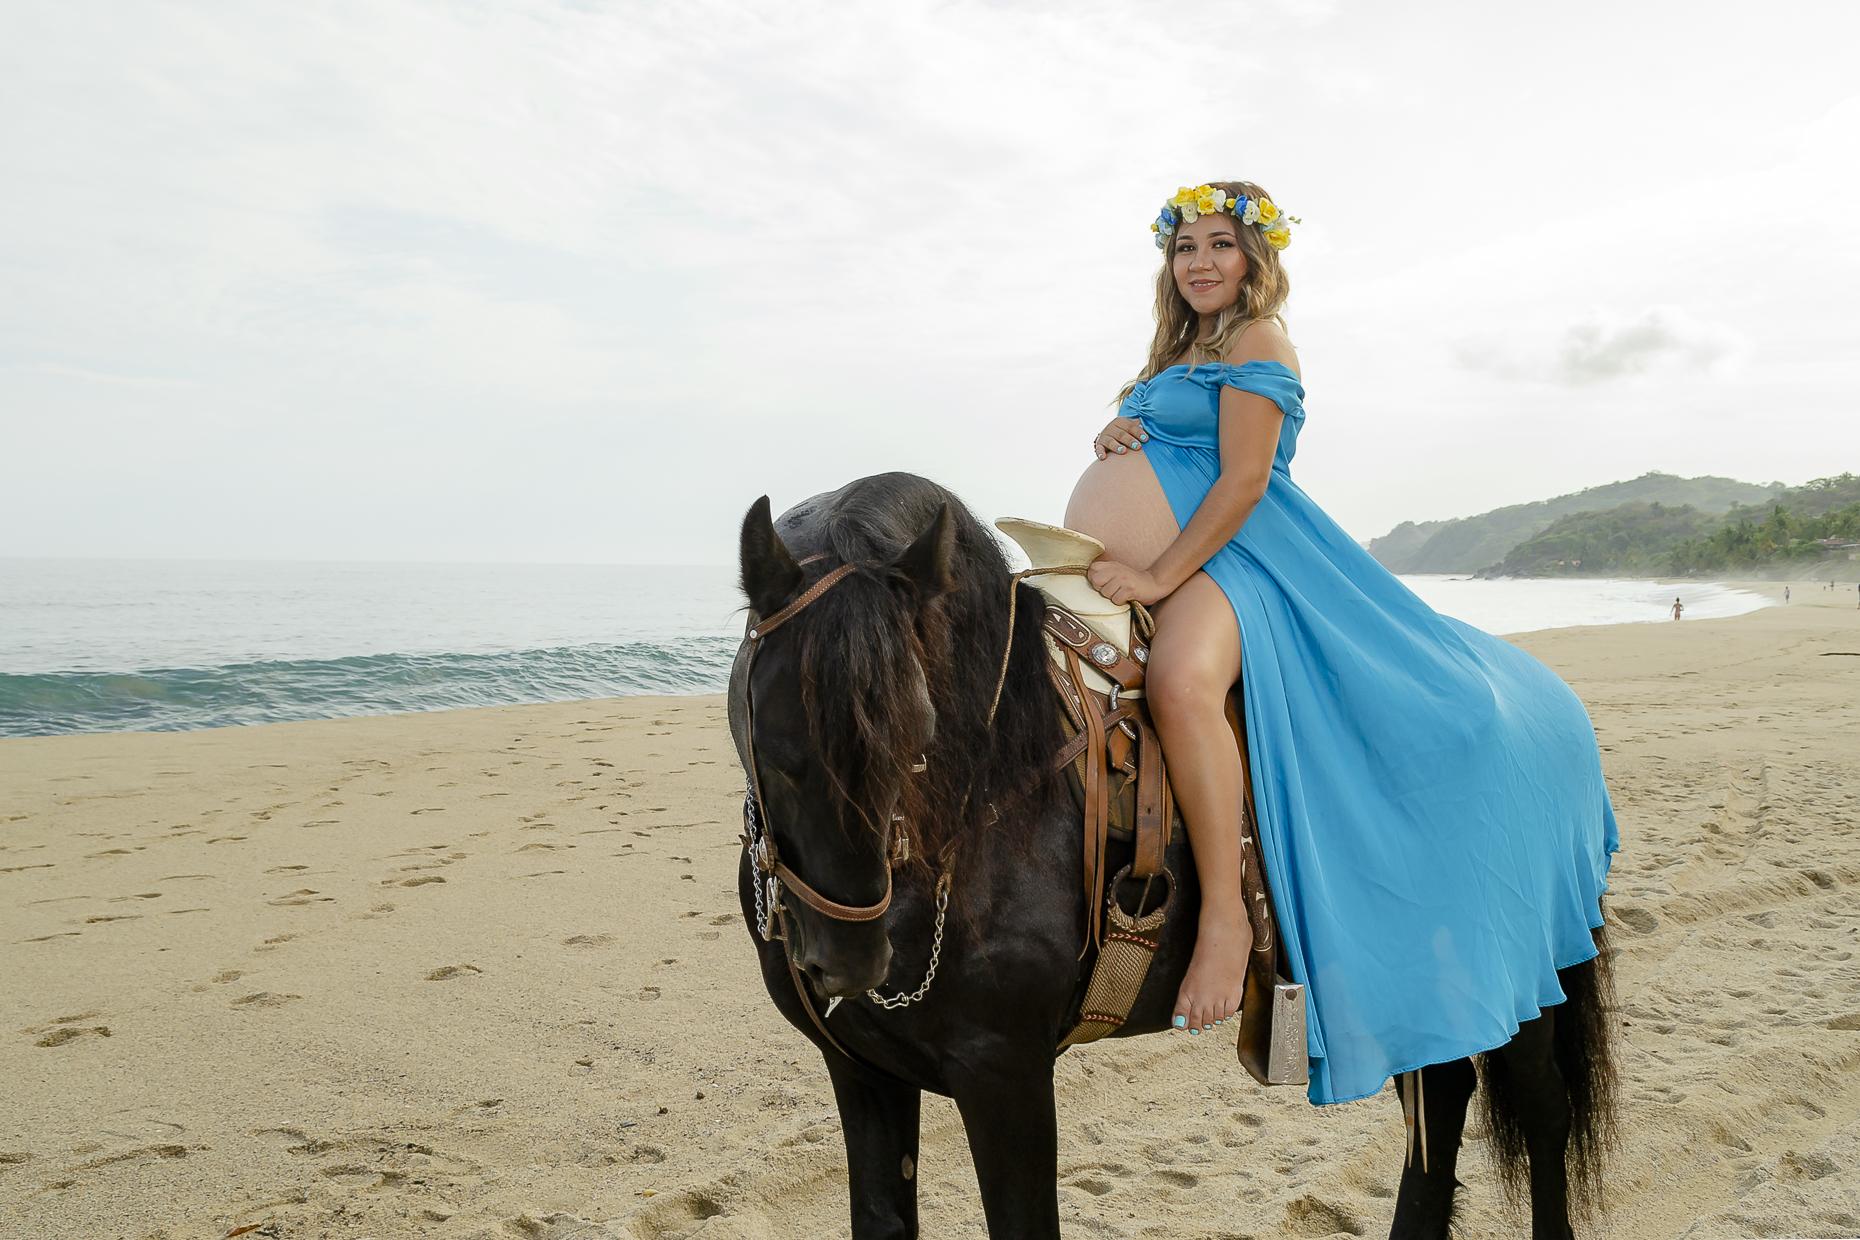 Fotografo--Puerto-Vallarta--Alex-y-Rebeca-Fotografia--Sayulita--Nayarit--Caballos--Playa--Familia--Embarazo--Lifestyle--Maternidad--